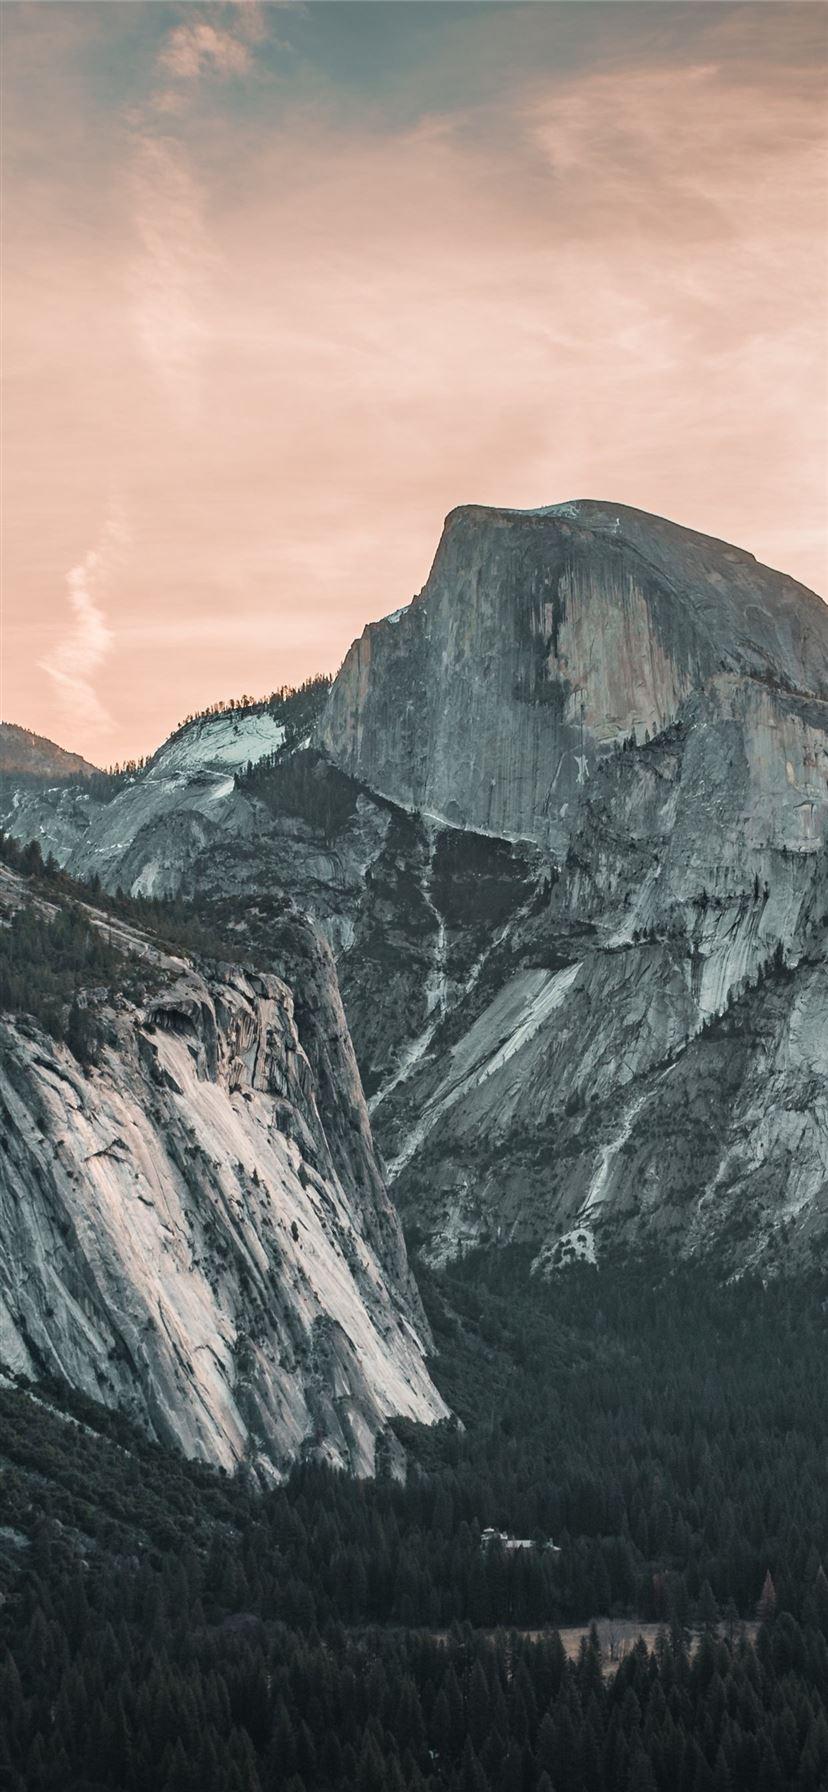 Yosemite Valley 4k 5k Sony Xperia X Xz Z5 Premium Iphone 11 Wallpapers Free Download